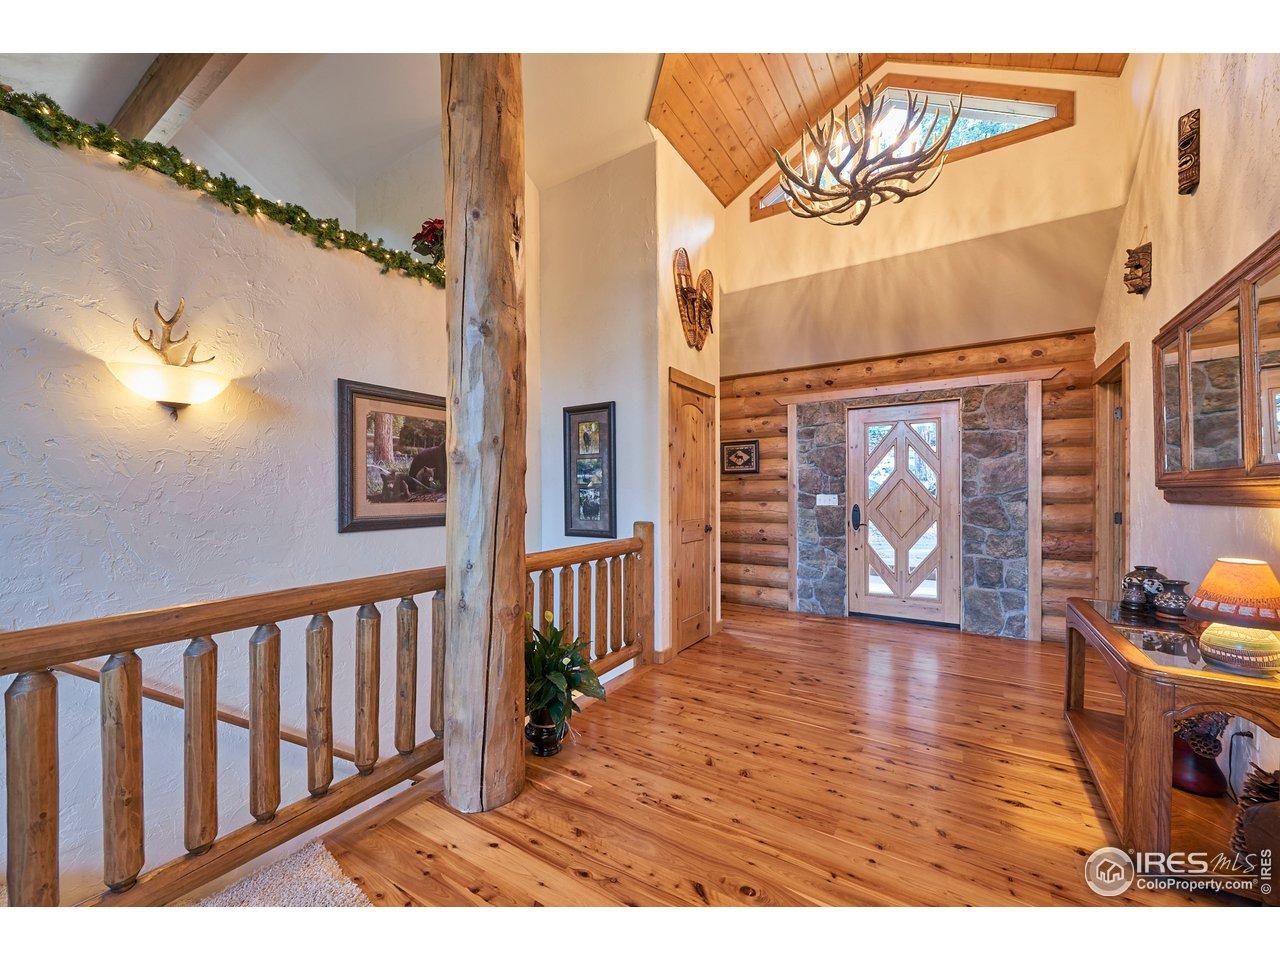 Formal entry w/ vaulted ceilings & Cypress floors